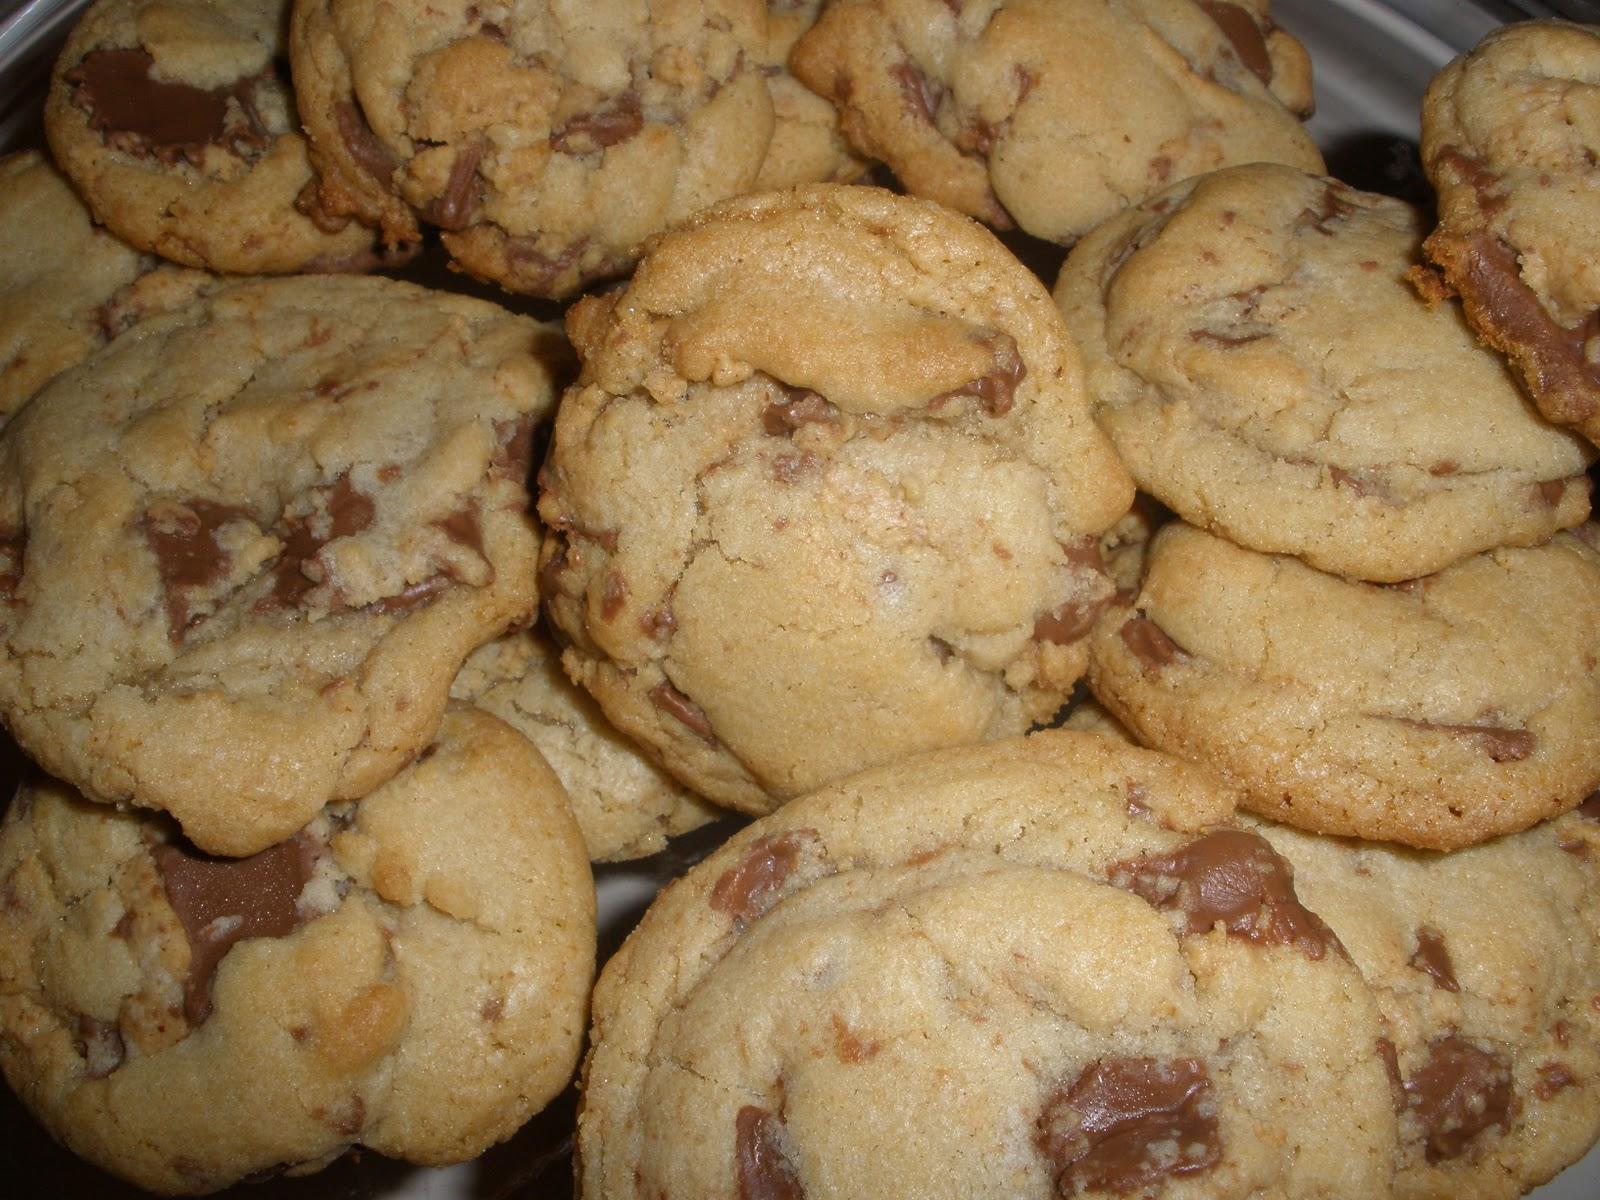 Sweet treats peanut butter cup cookies east coast chic for Easy sweet treats with peanut butter